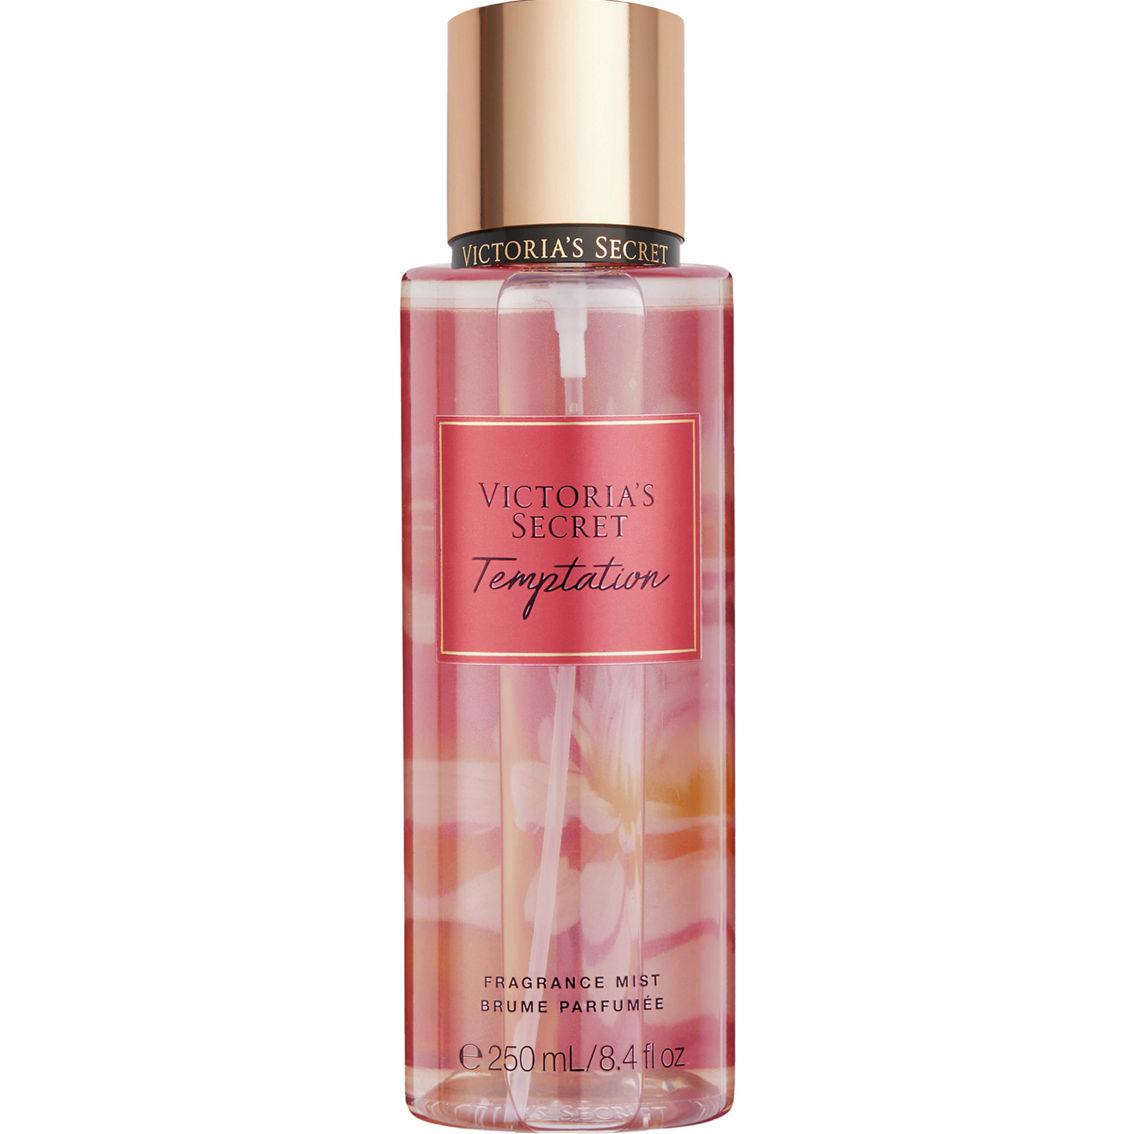 Victoria's Secret Body Beauty Temptation MistWomen's Fragrances Ybfgyv76